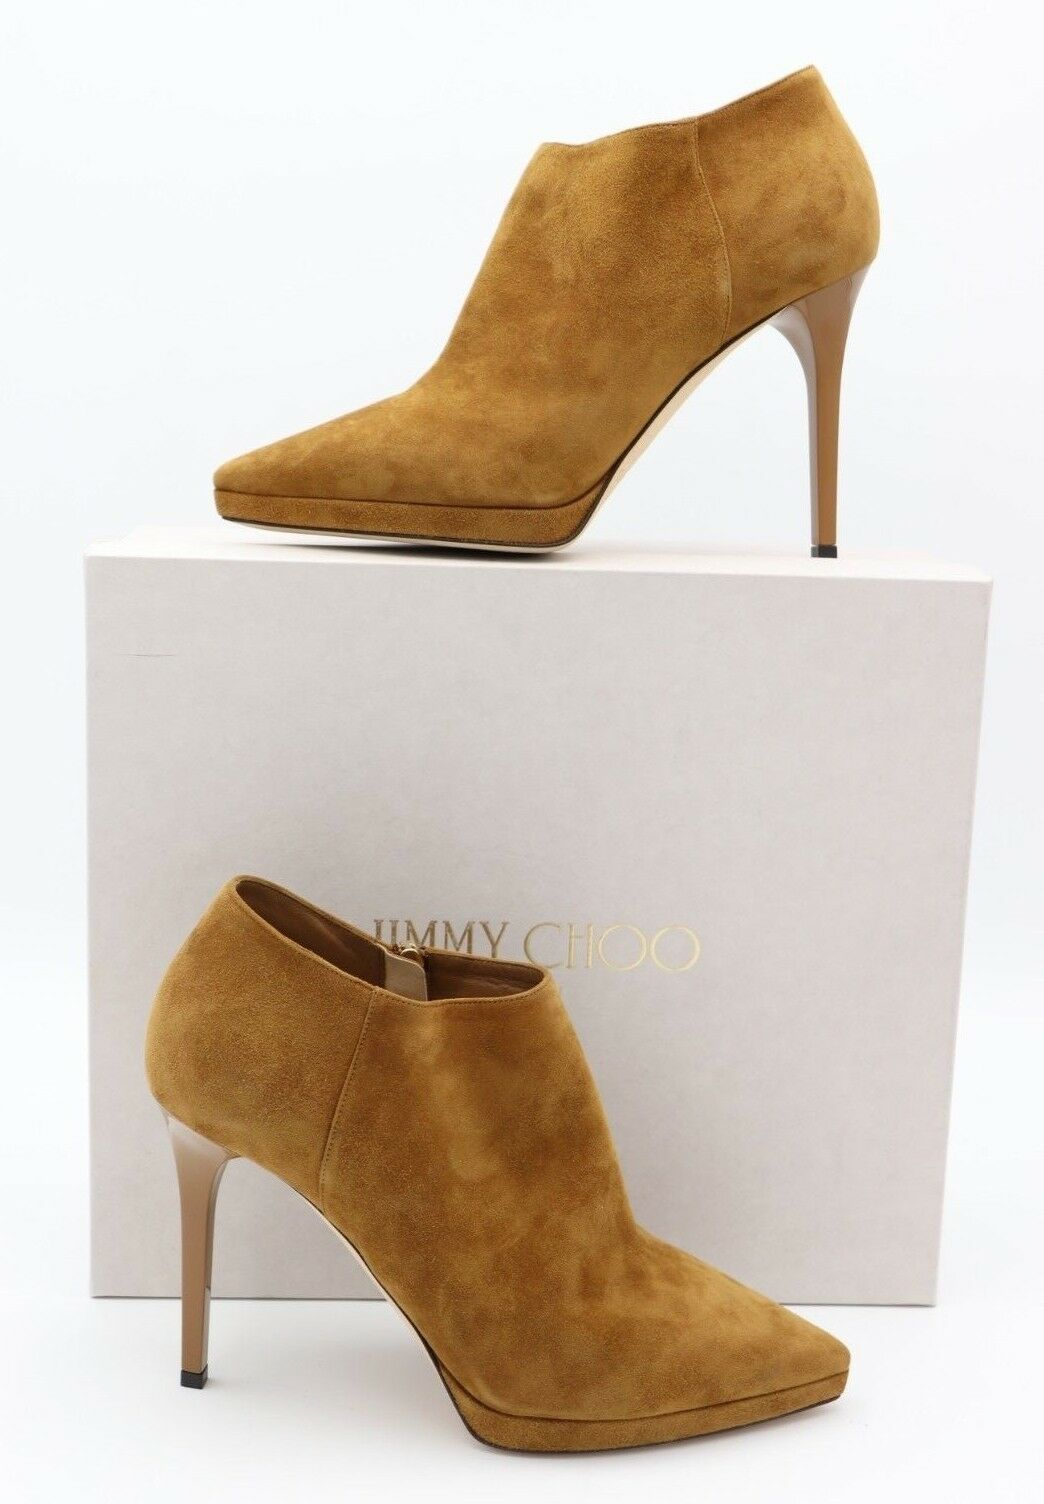 Jimmy Choo Lindsey 100 Brown Suede Platform Point-Toe Shoe Ankle Booties 10 40 - $475.00